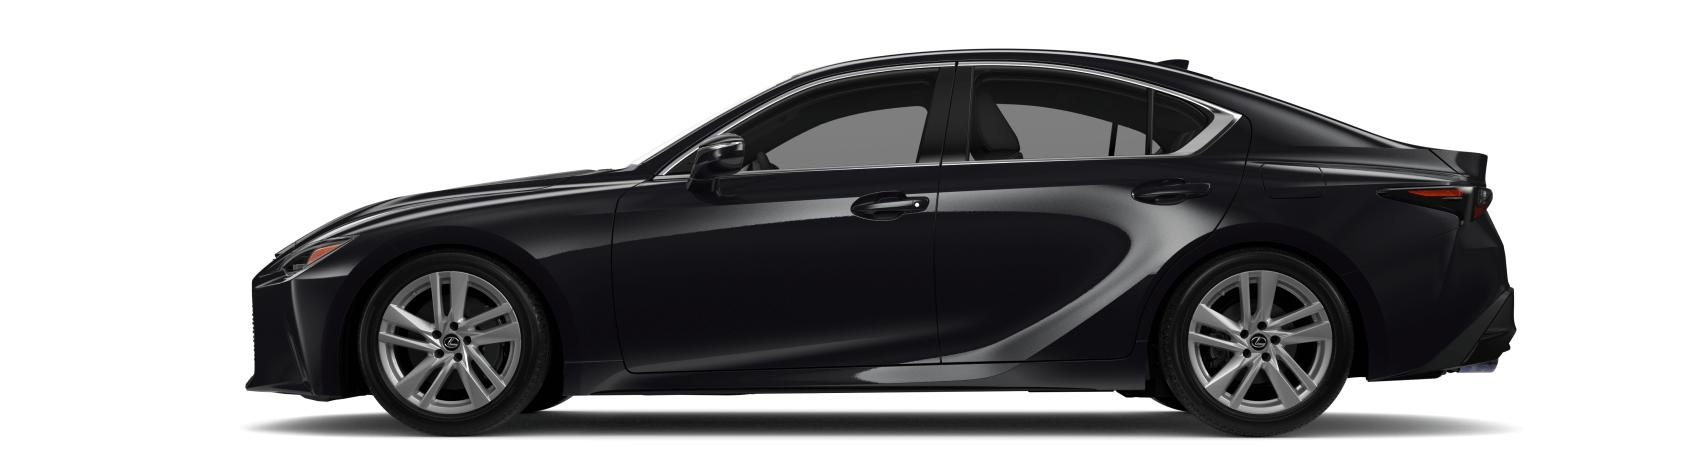 Lexus IS 300 Black